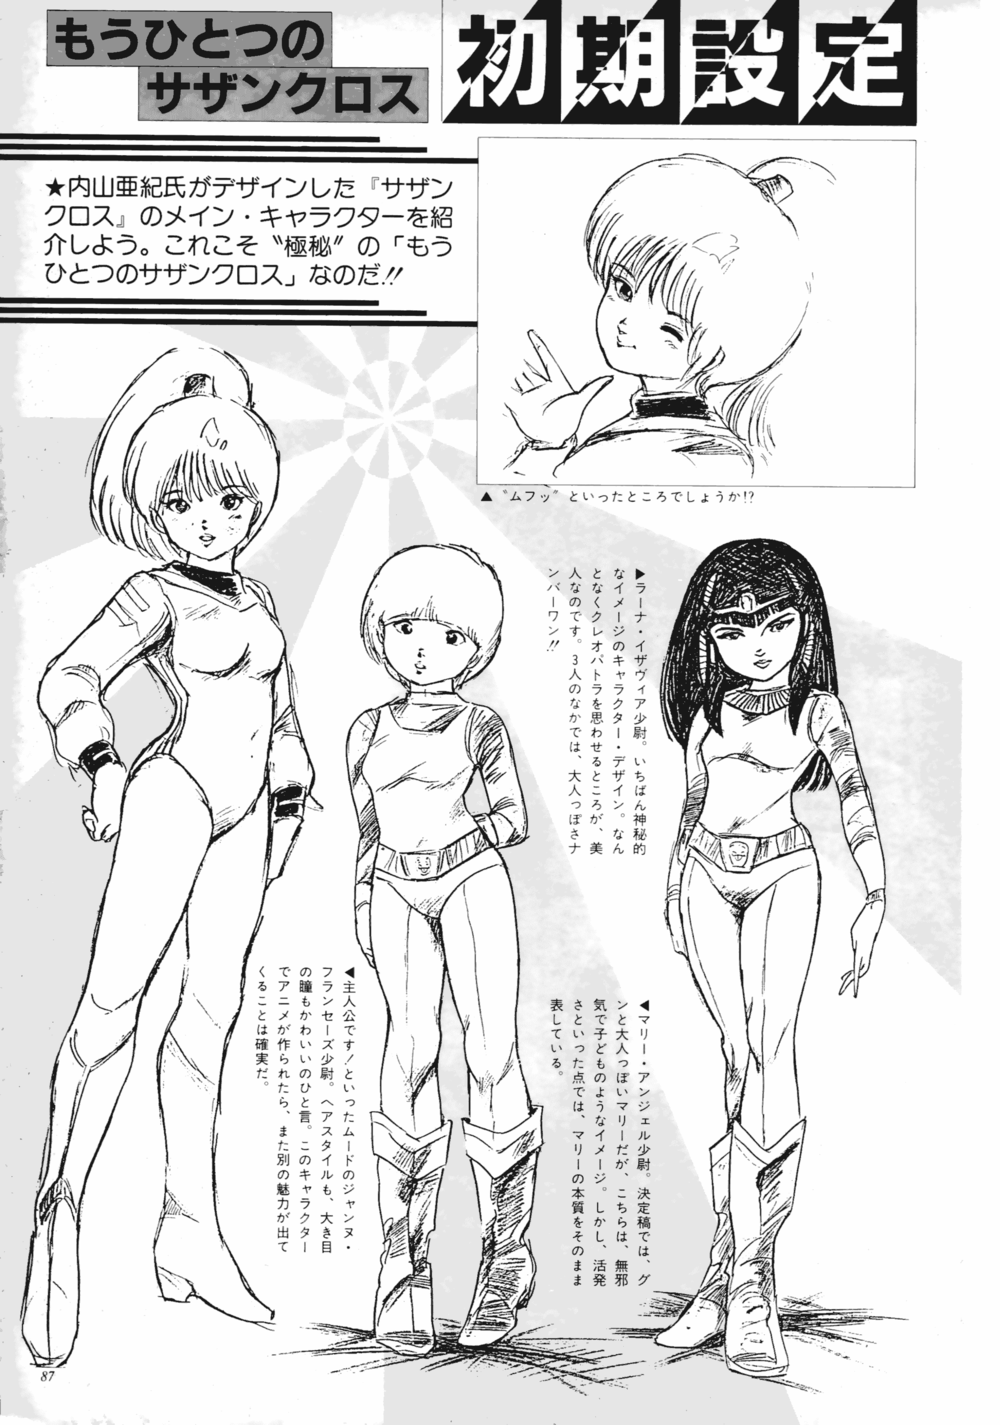 Aki Uchiyama's original character designs